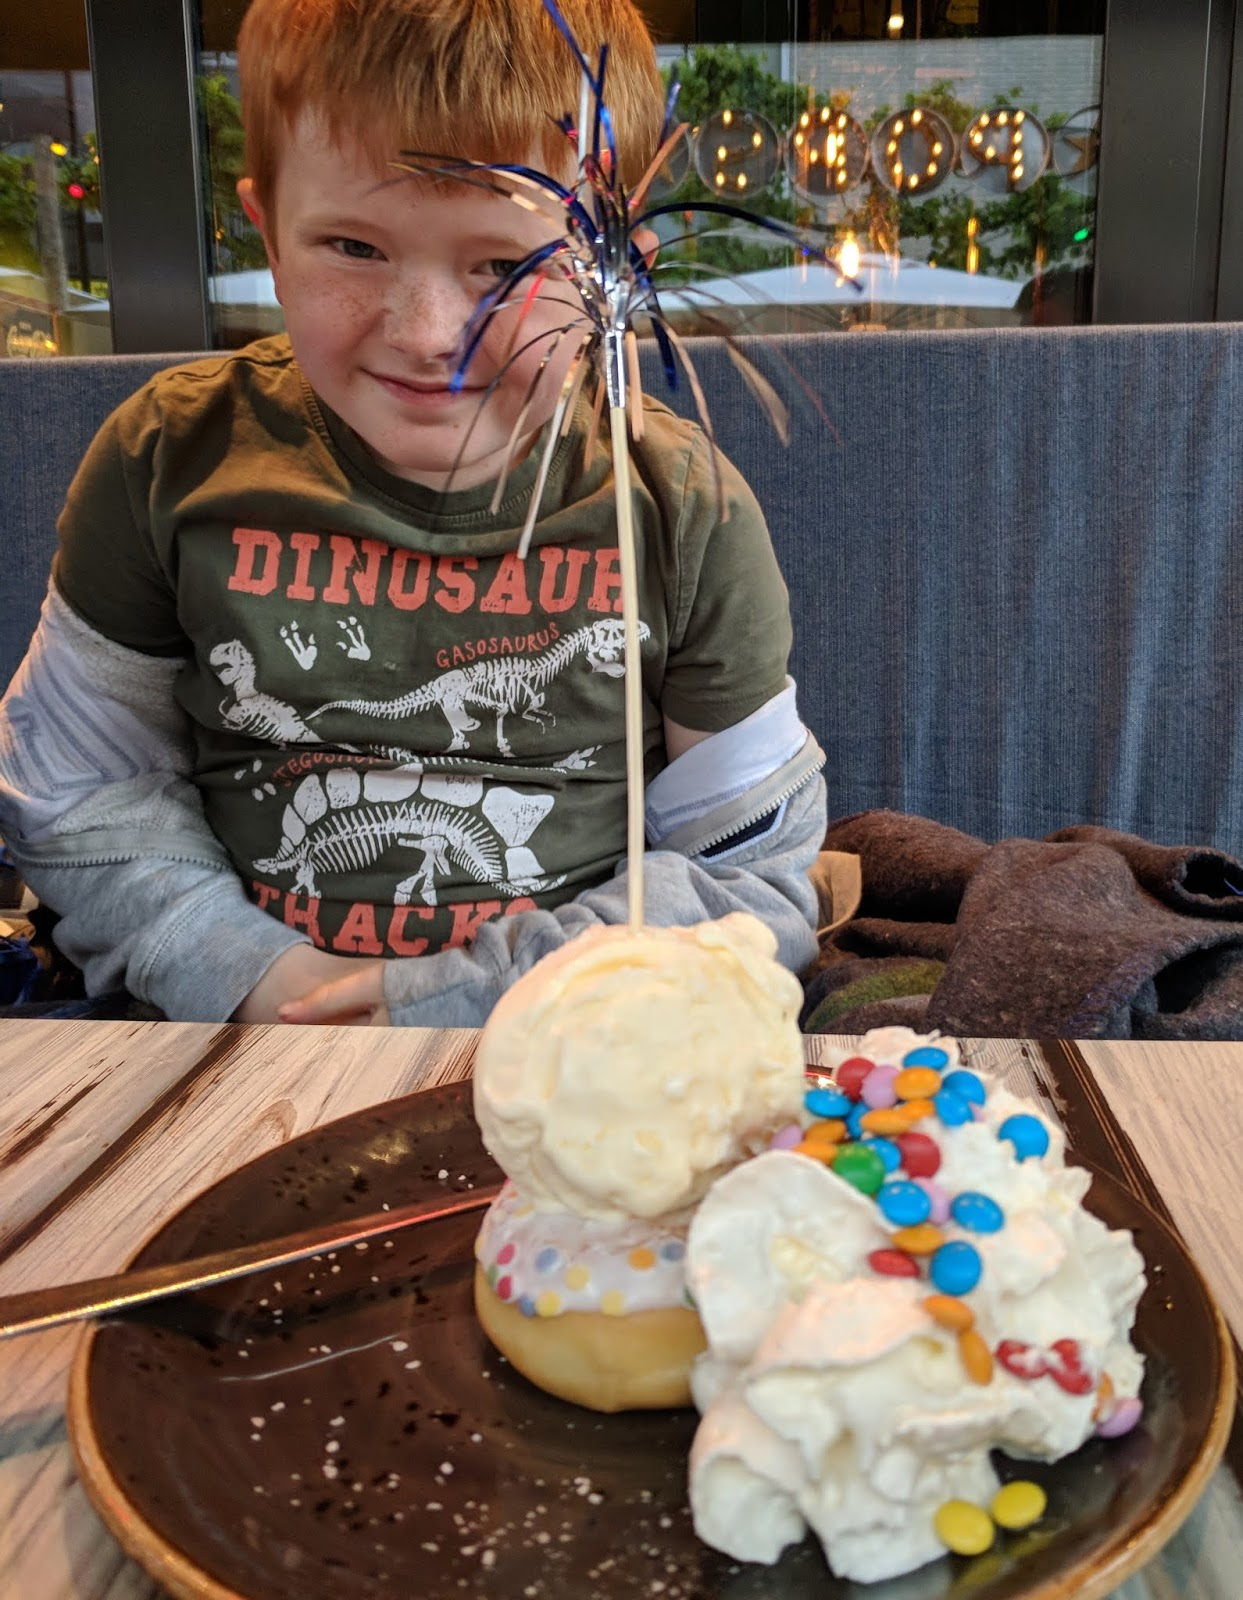 Kids dessert from Pops American Diner in Wassenaar